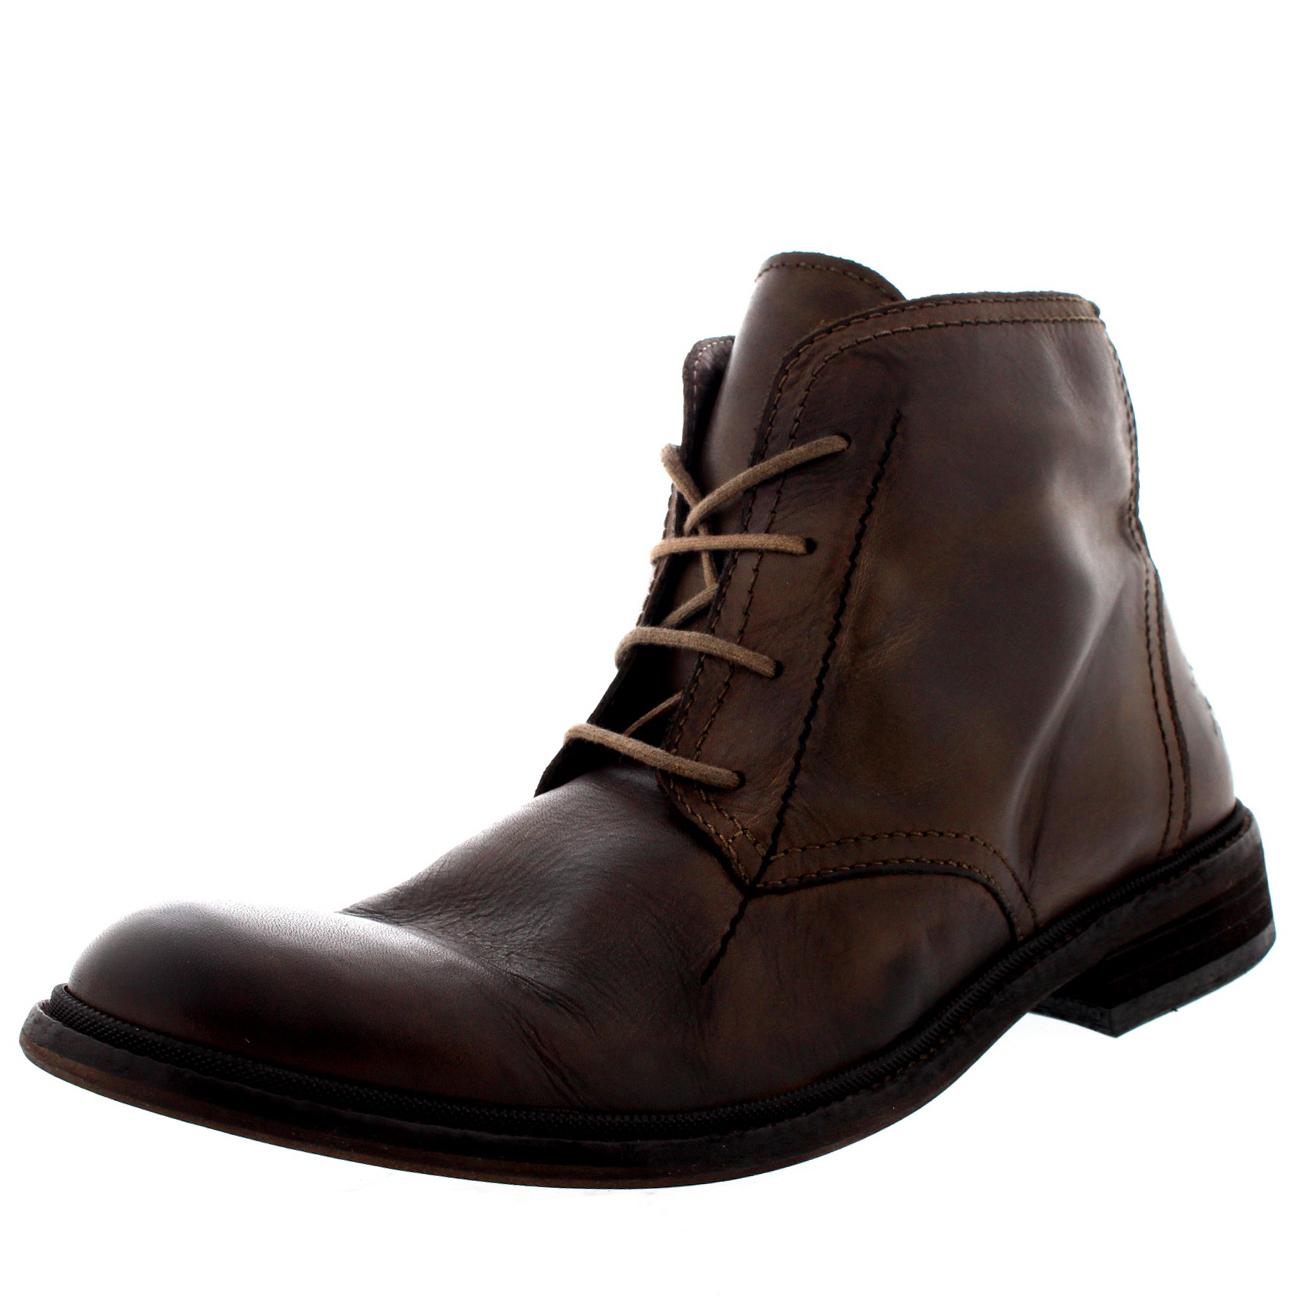 Mens Fly London Hobi Formal Work Office Casual Leder Ankle Stiefel All Gres